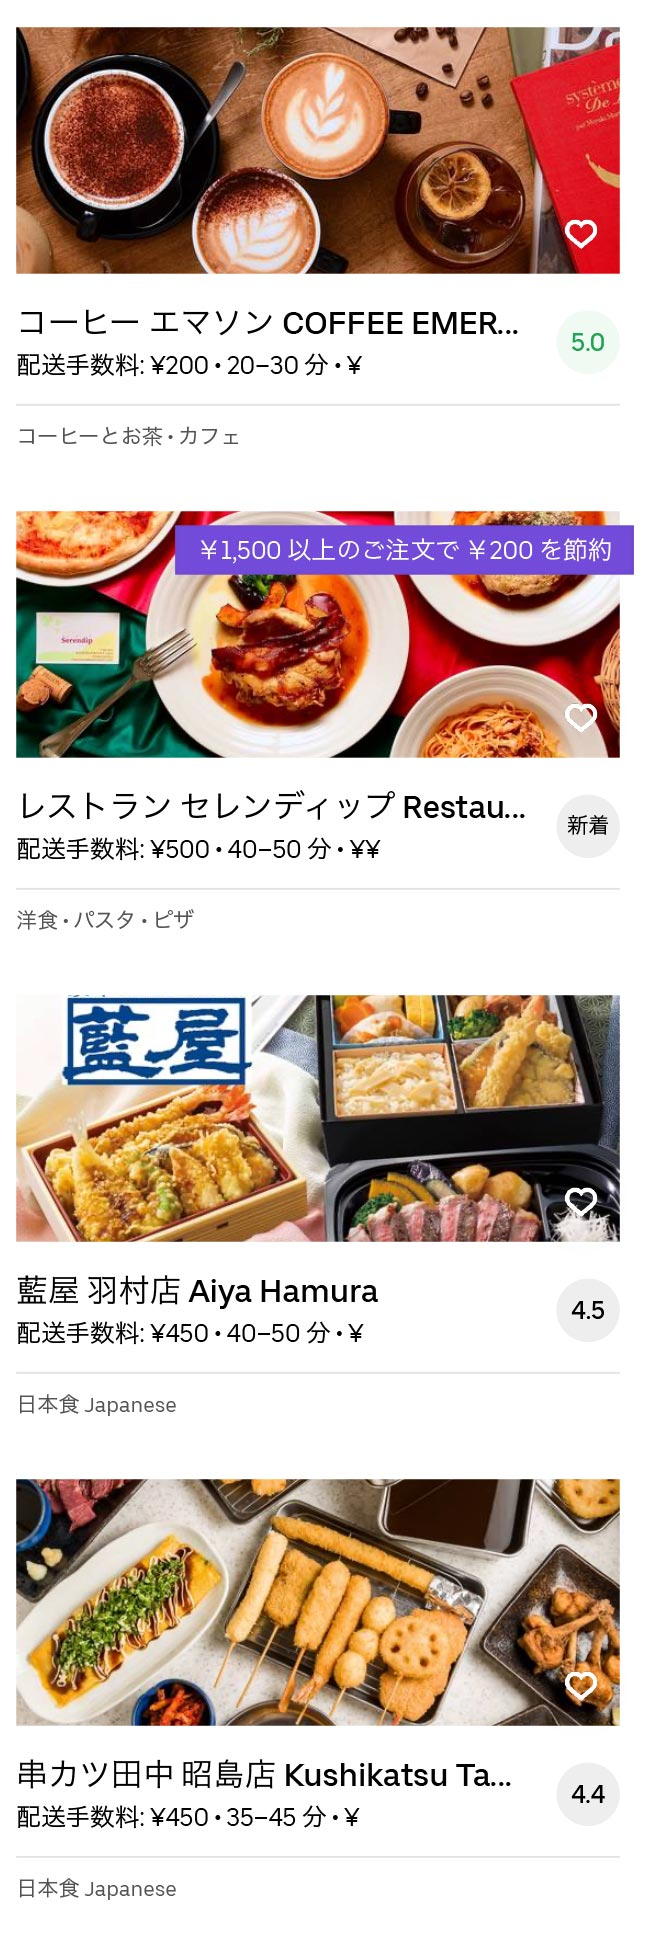 Fussa menu 2004 04